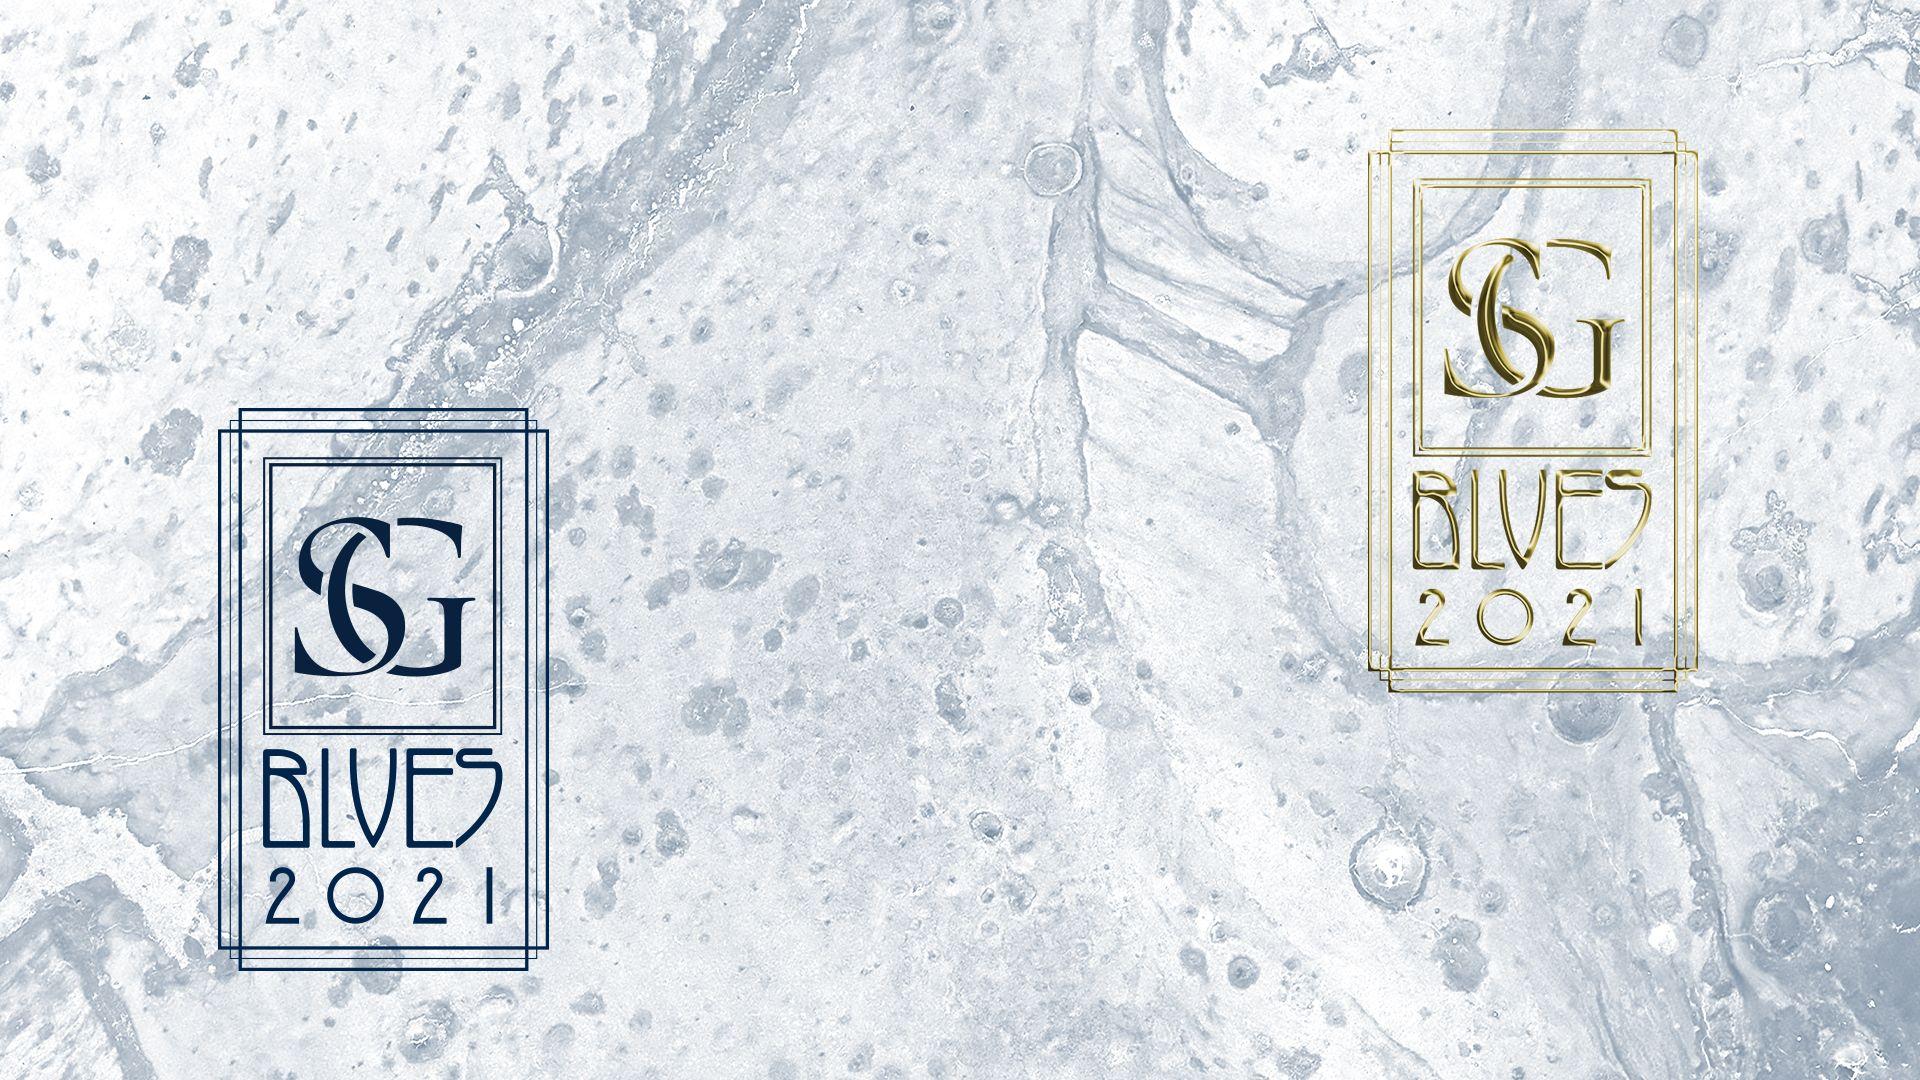 SG Blues   website banner   2